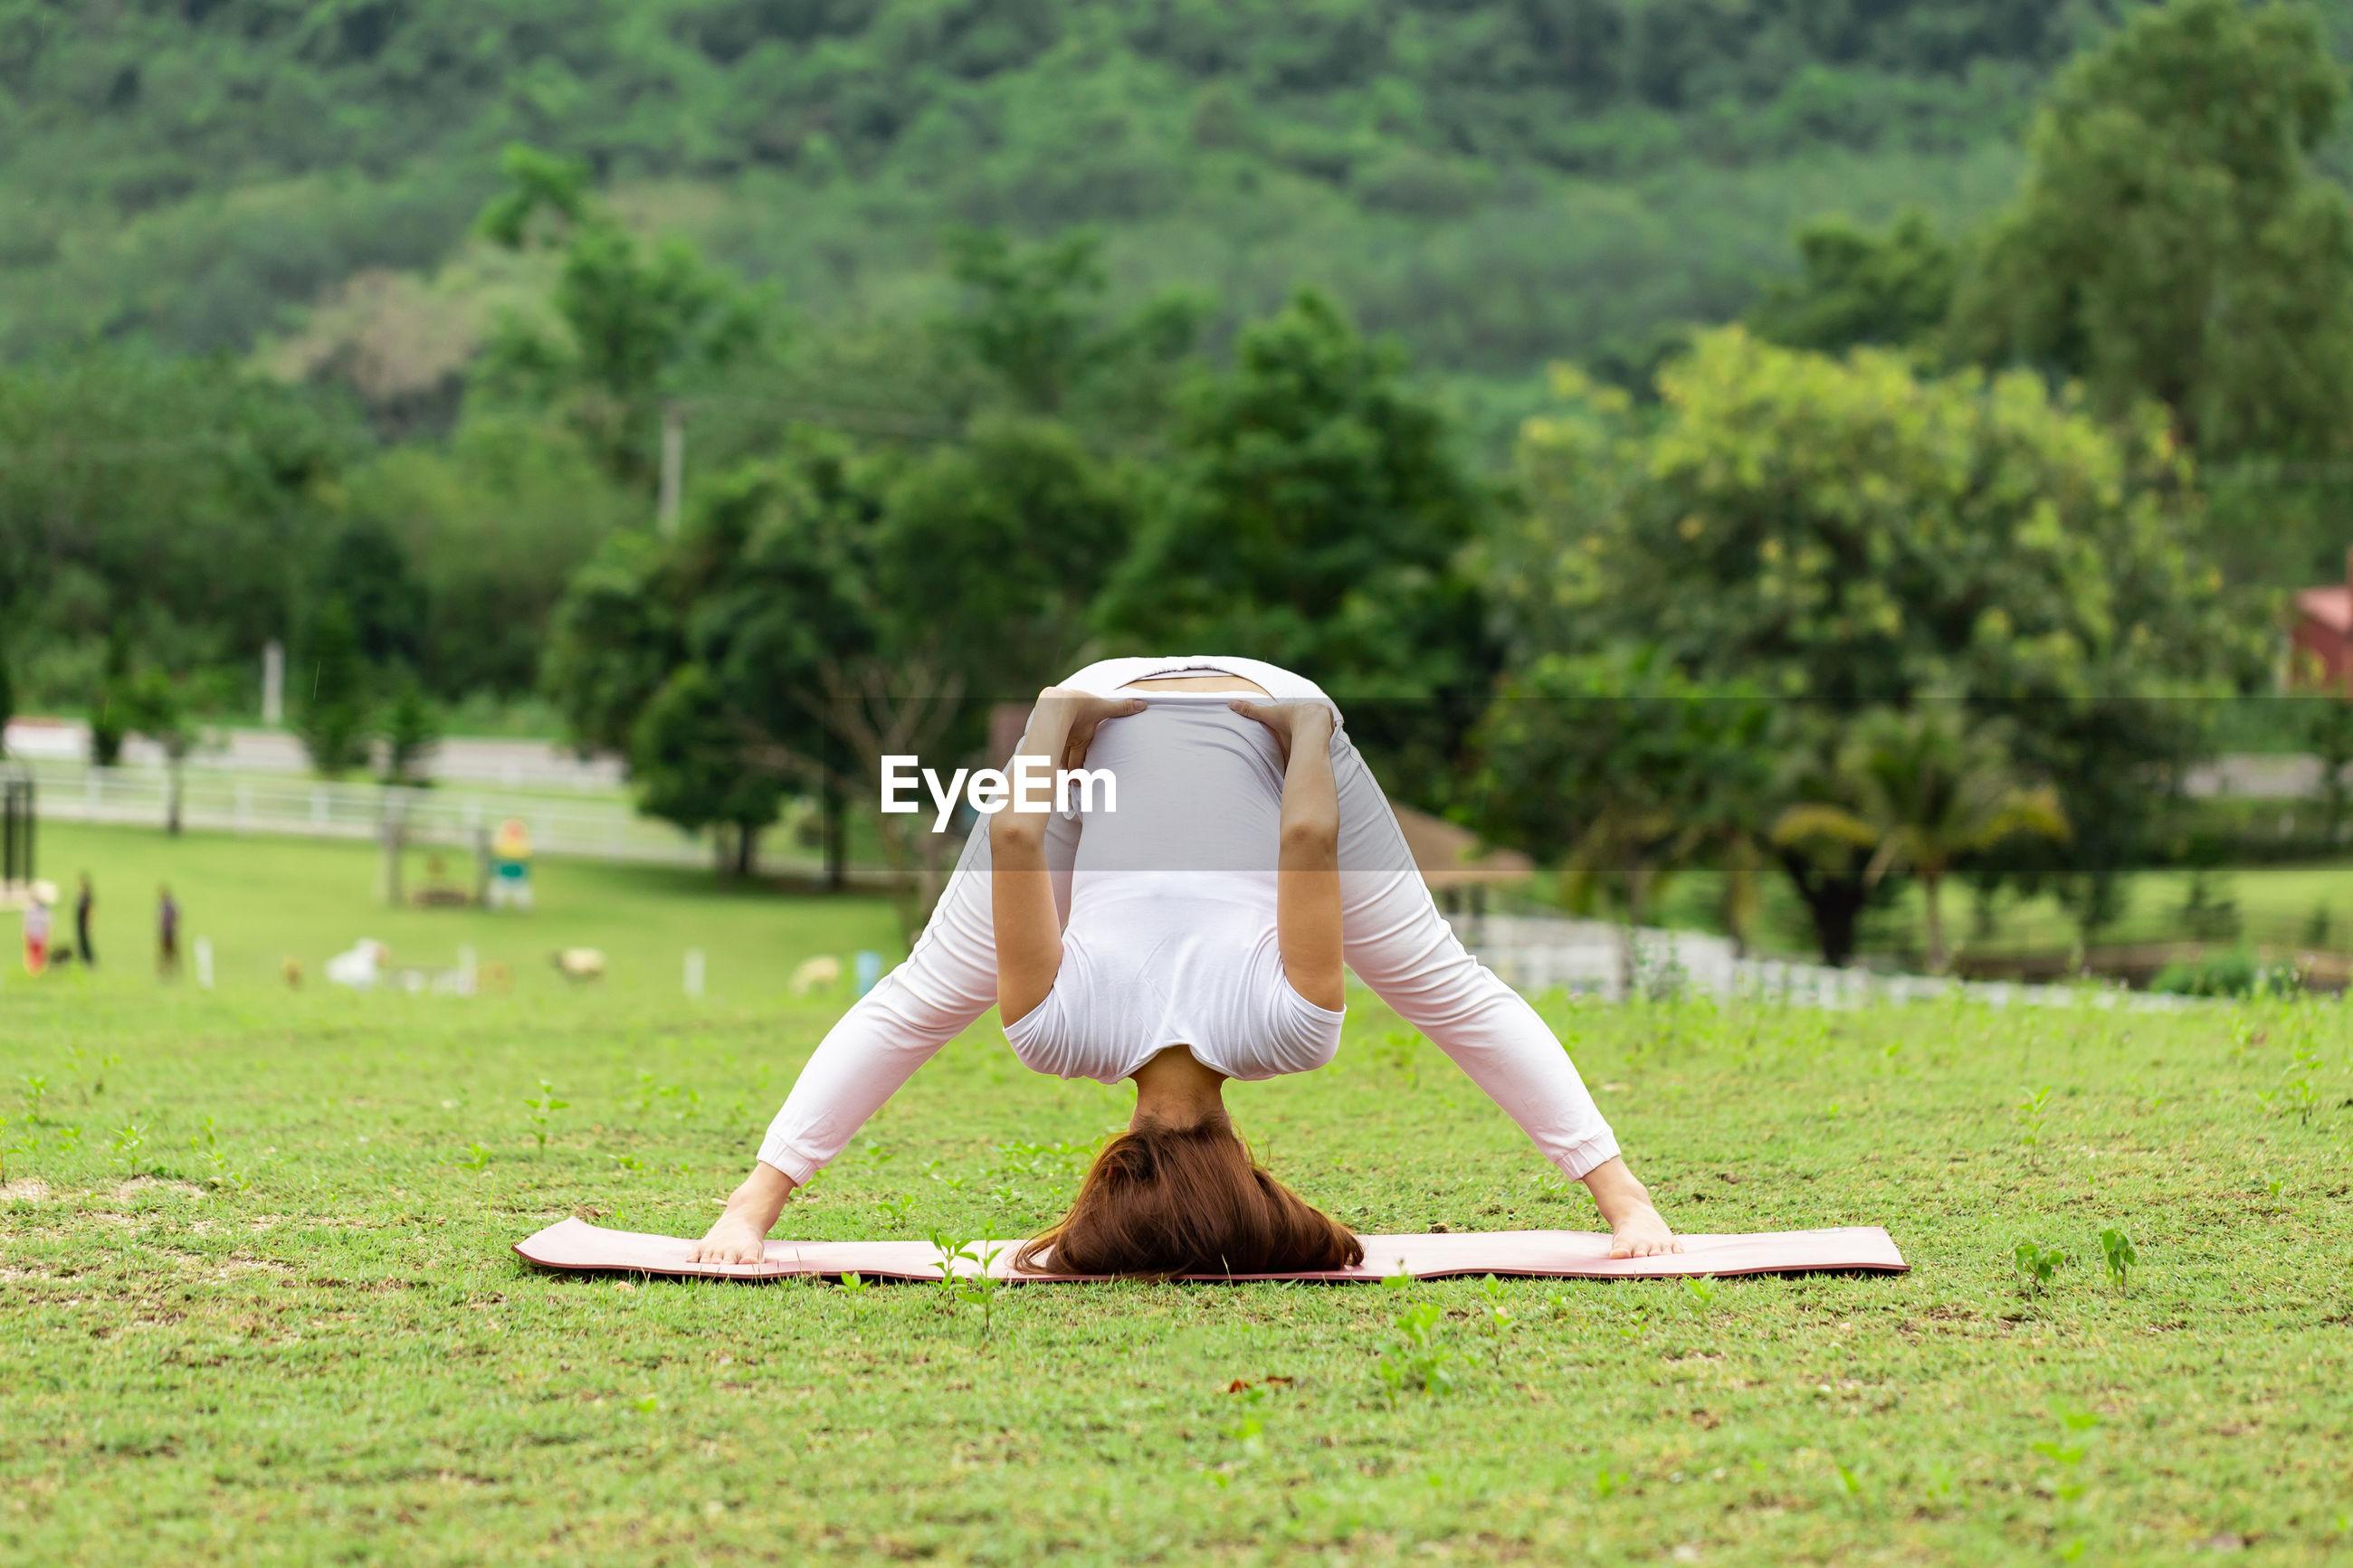 Full length of woman doing yoga on grass